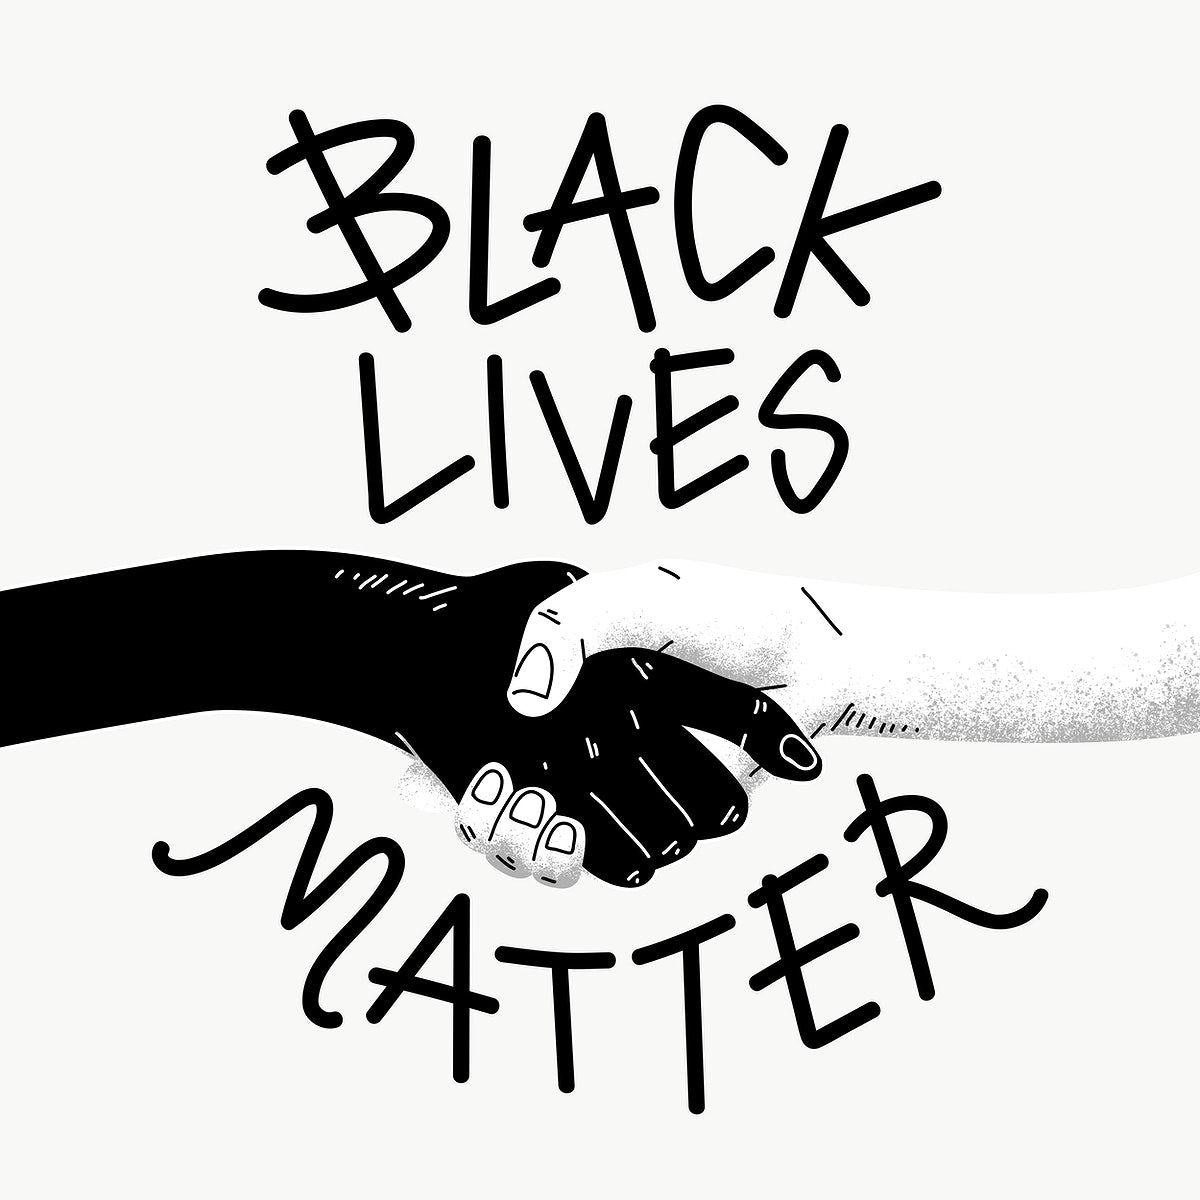 Black Lives Matter Social Template Design Element Free Image By Rawpixel Com Techi Black Lives Social Templates Black Lives Matter